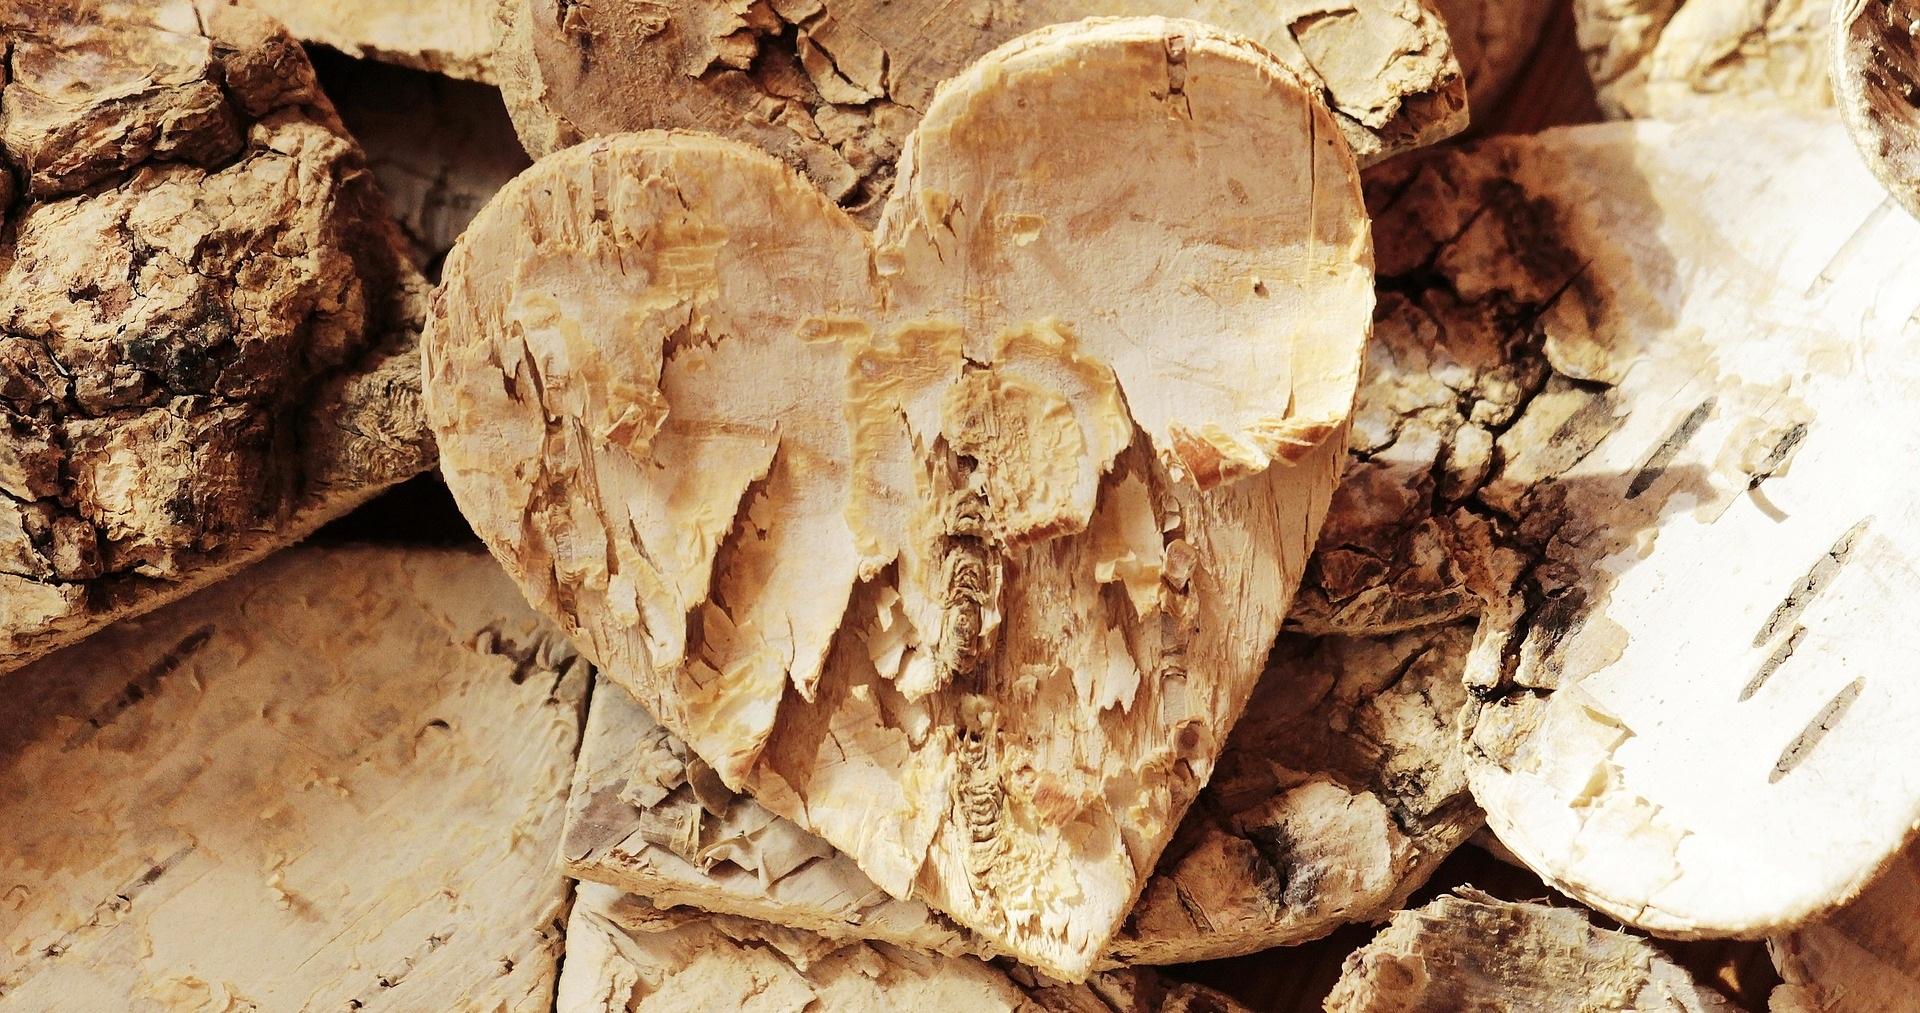 wood-heart-2904970_1920.jpg